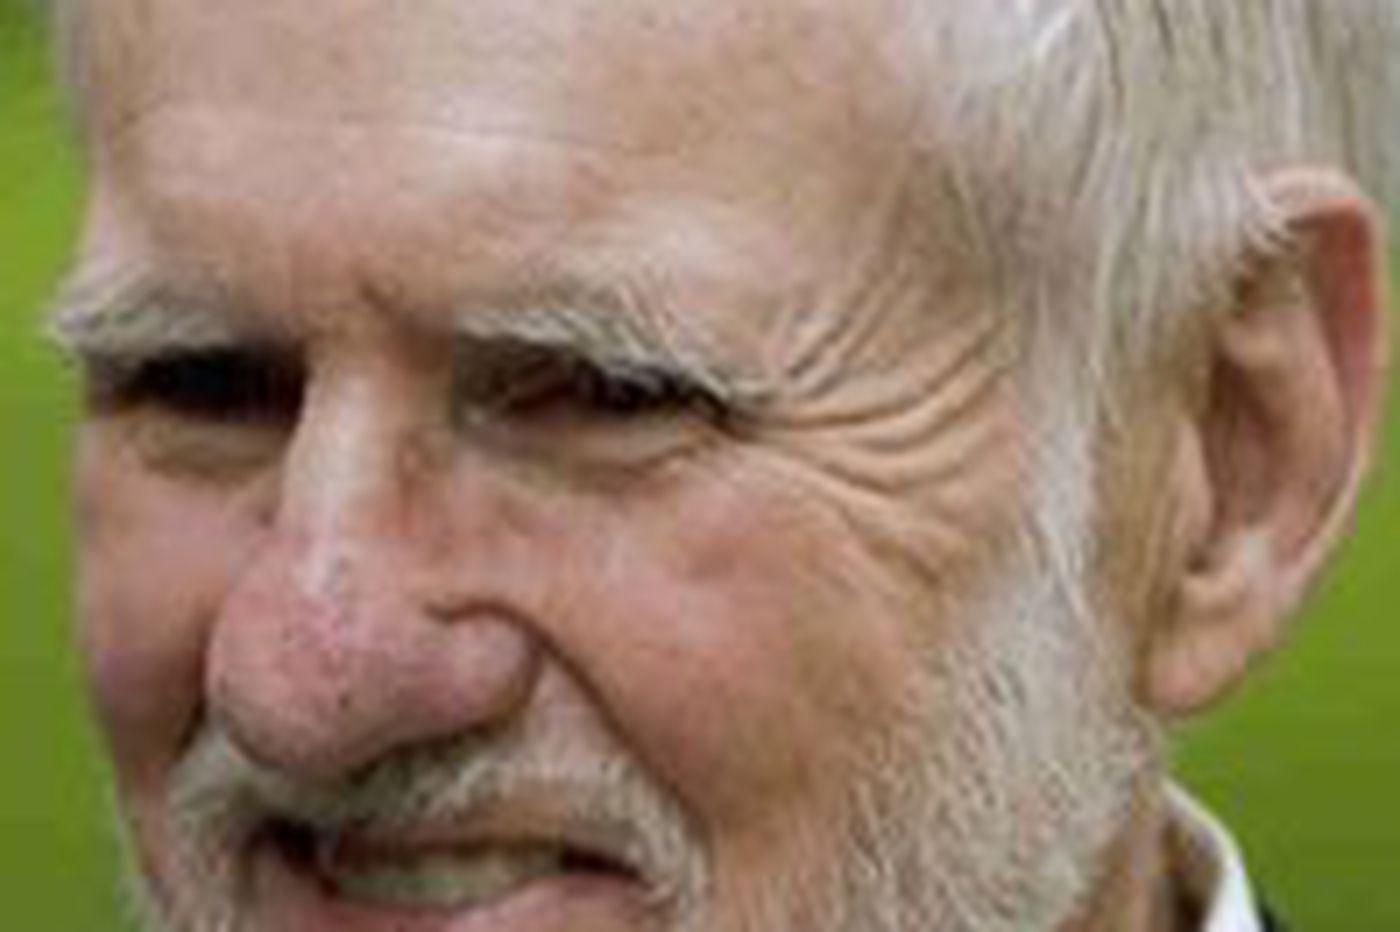 Robert G. Bryans | Contract administrator, 78